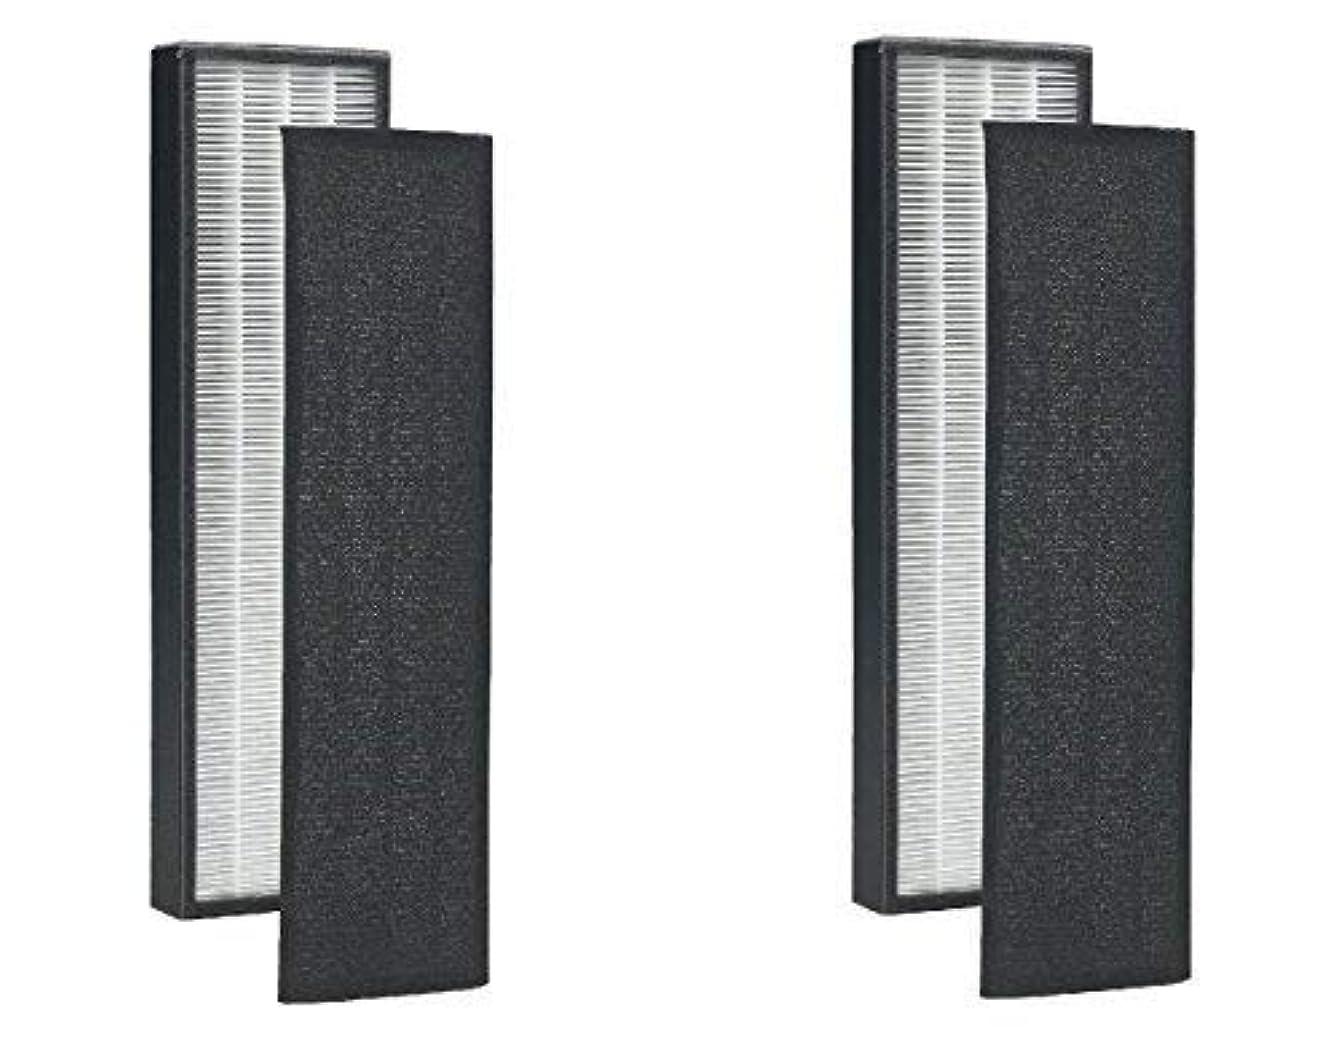 2 Pack - True HEPA Replacement Filter for GermGuardian FLT5000/FLT5111 AC5000 Series, Filter C Germ Guardian